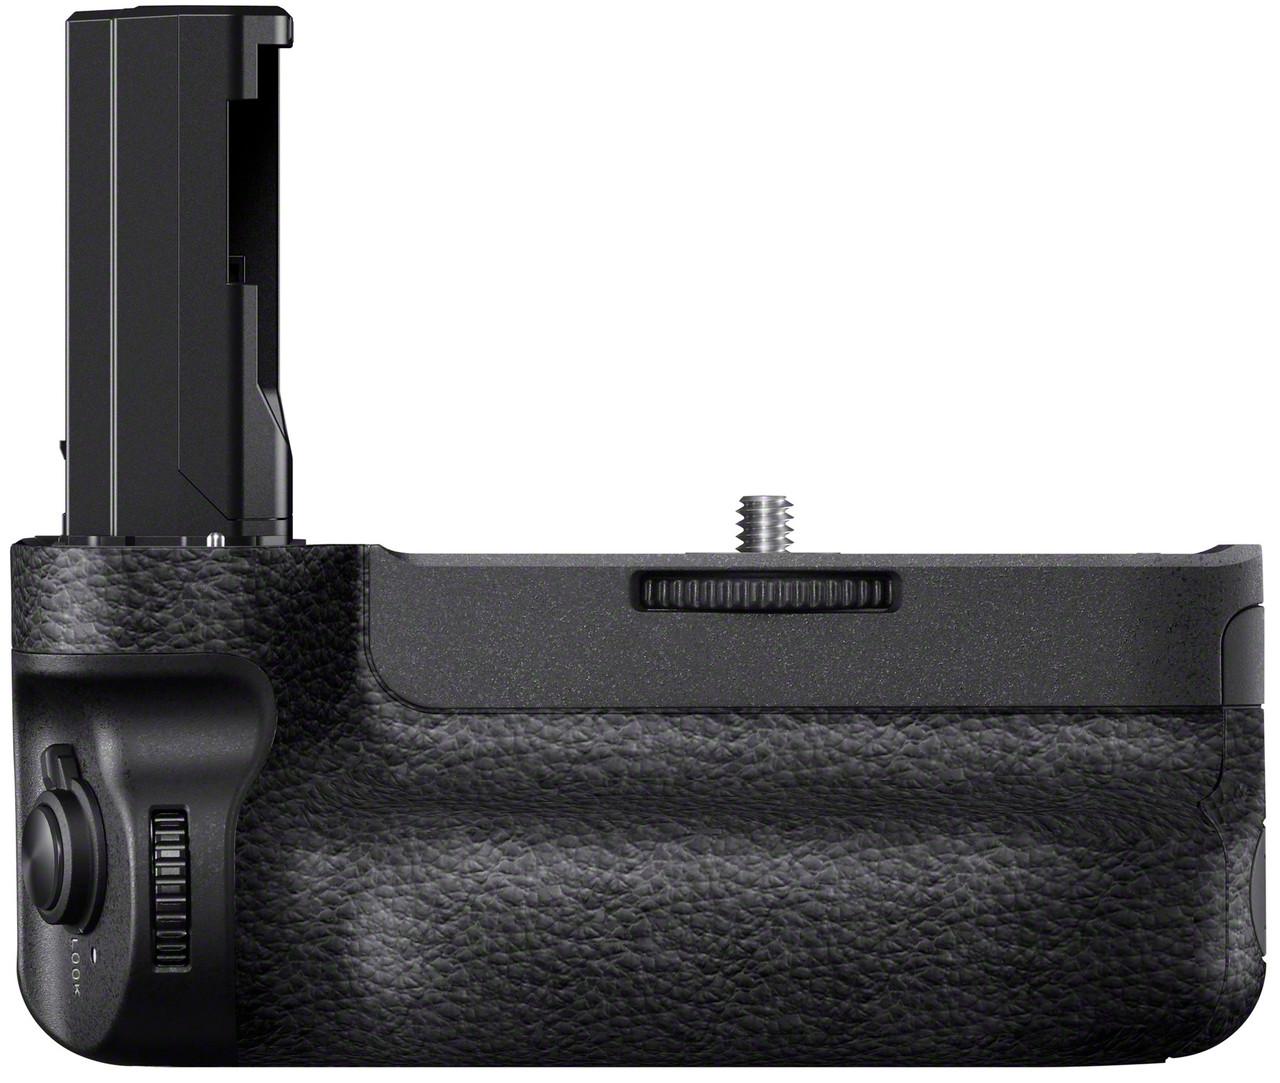 Sony VG-C3EM Vertical Grip for a9